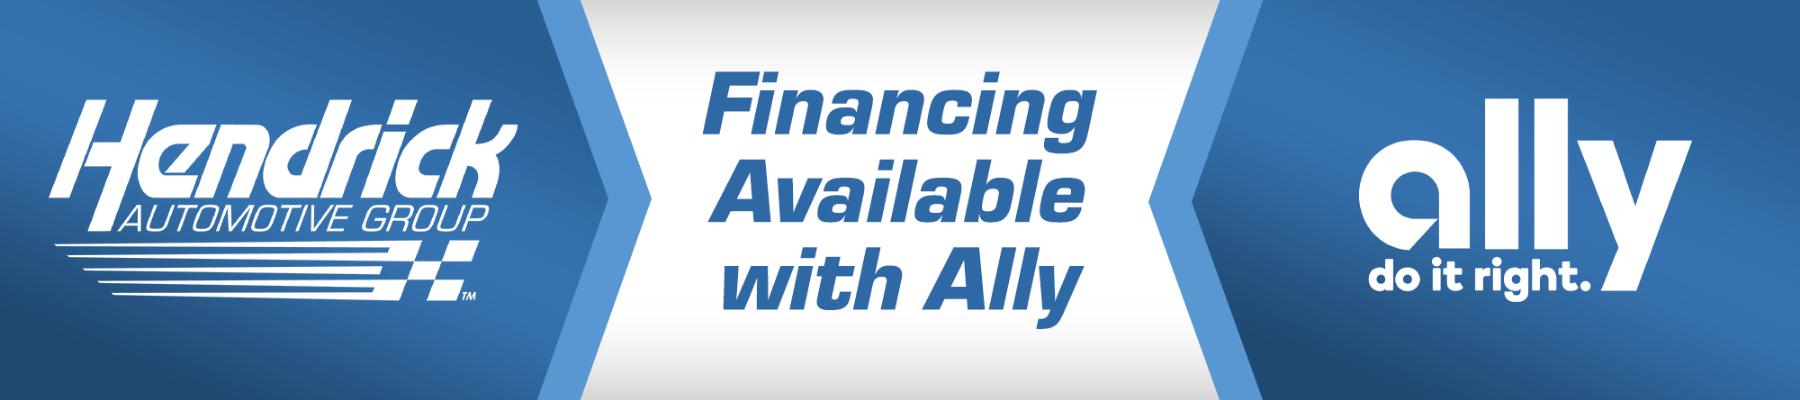 FinancingwithAlly